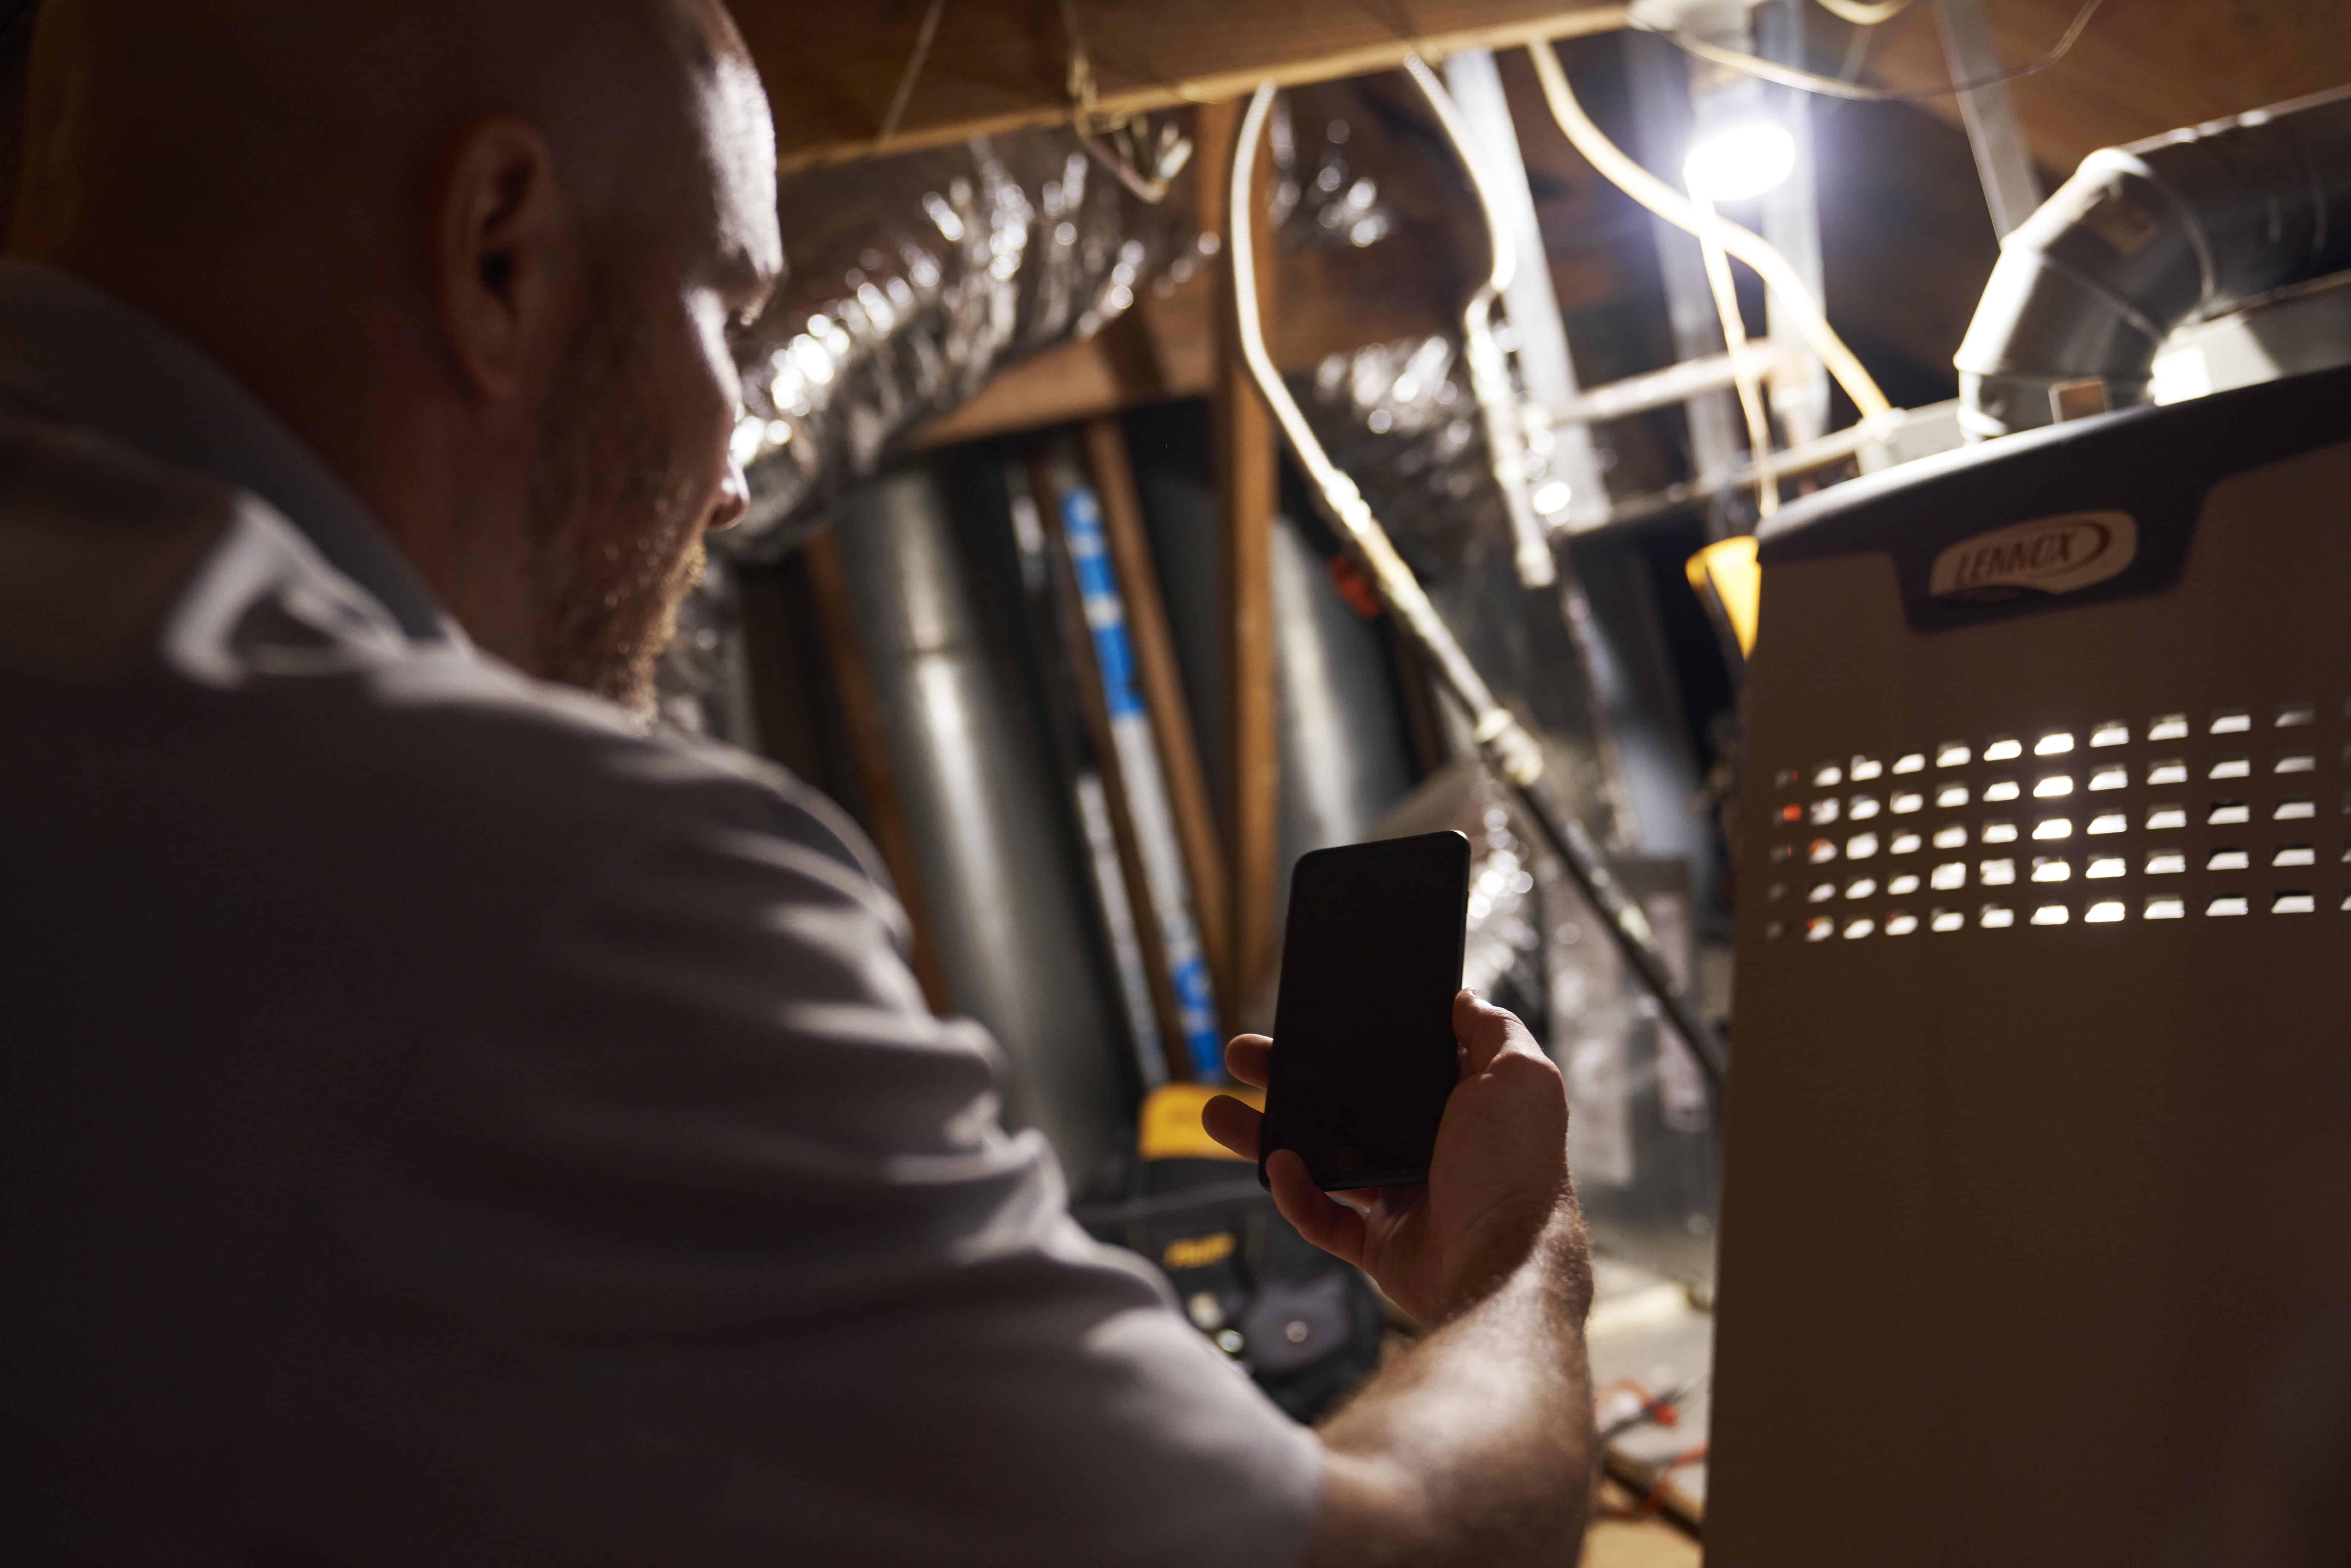 Technician servicing a HVAC system